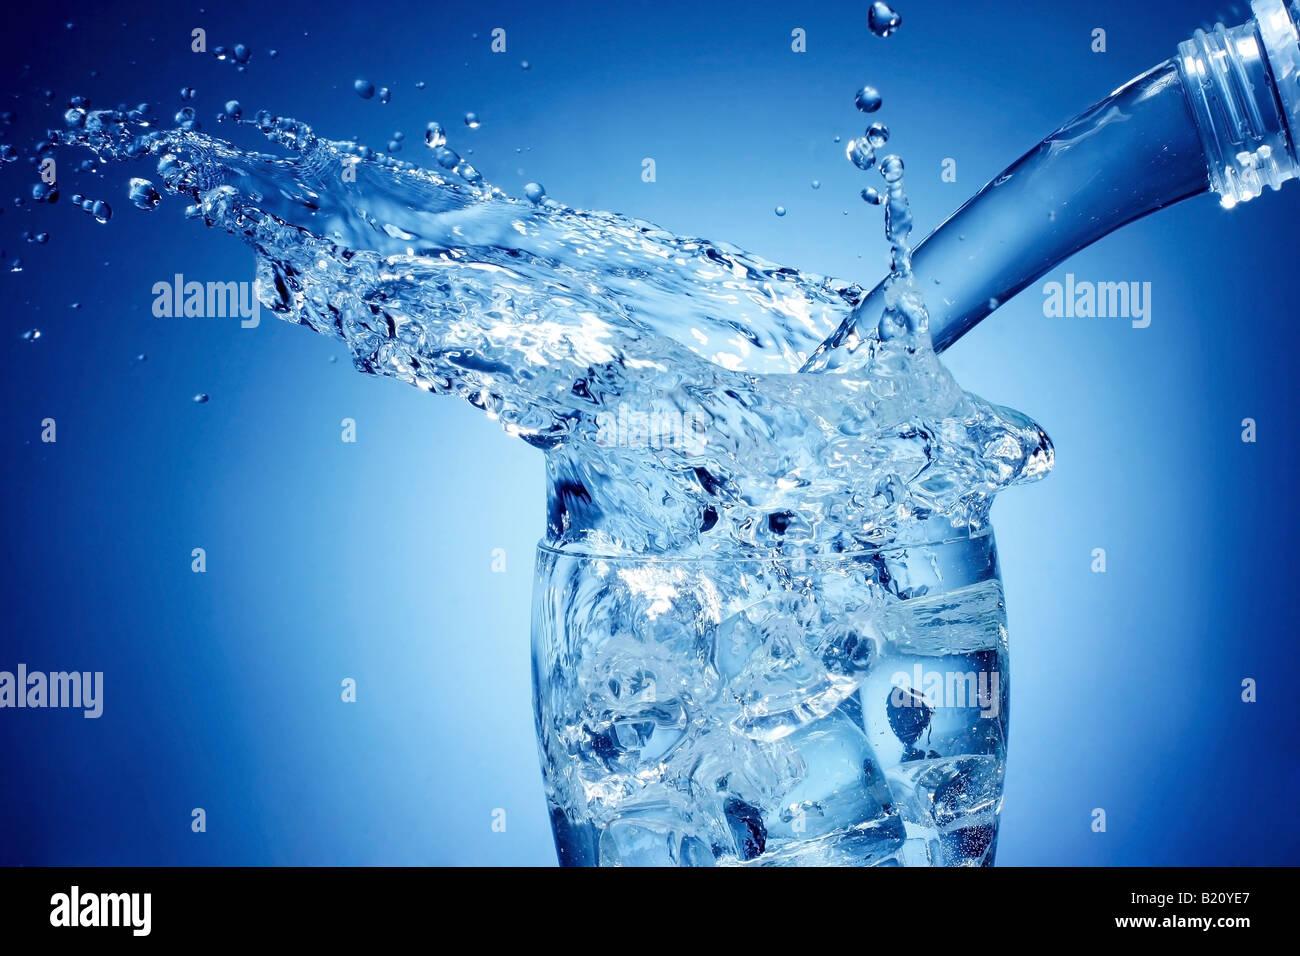 splash of water - Stock Image